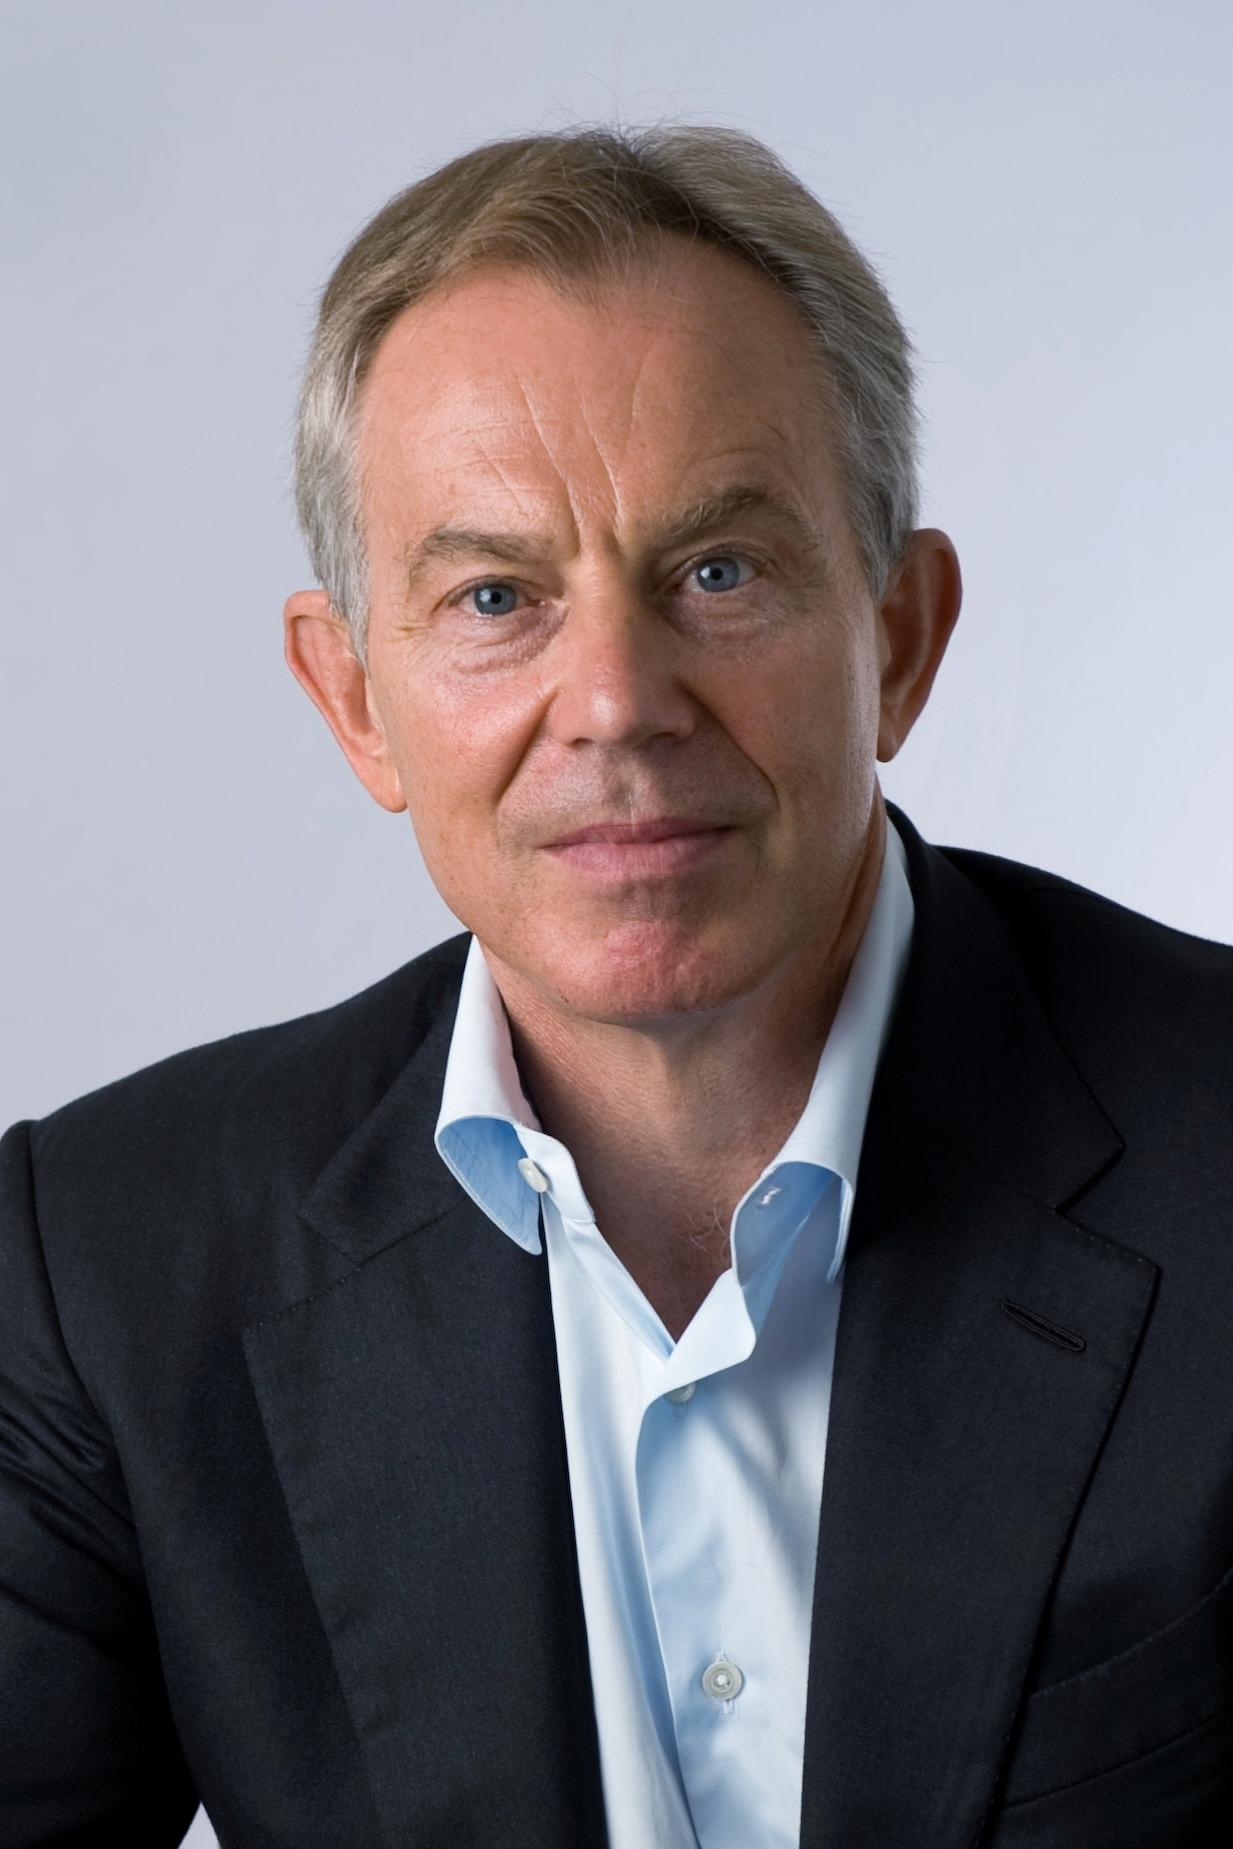 Tony Blair Latest